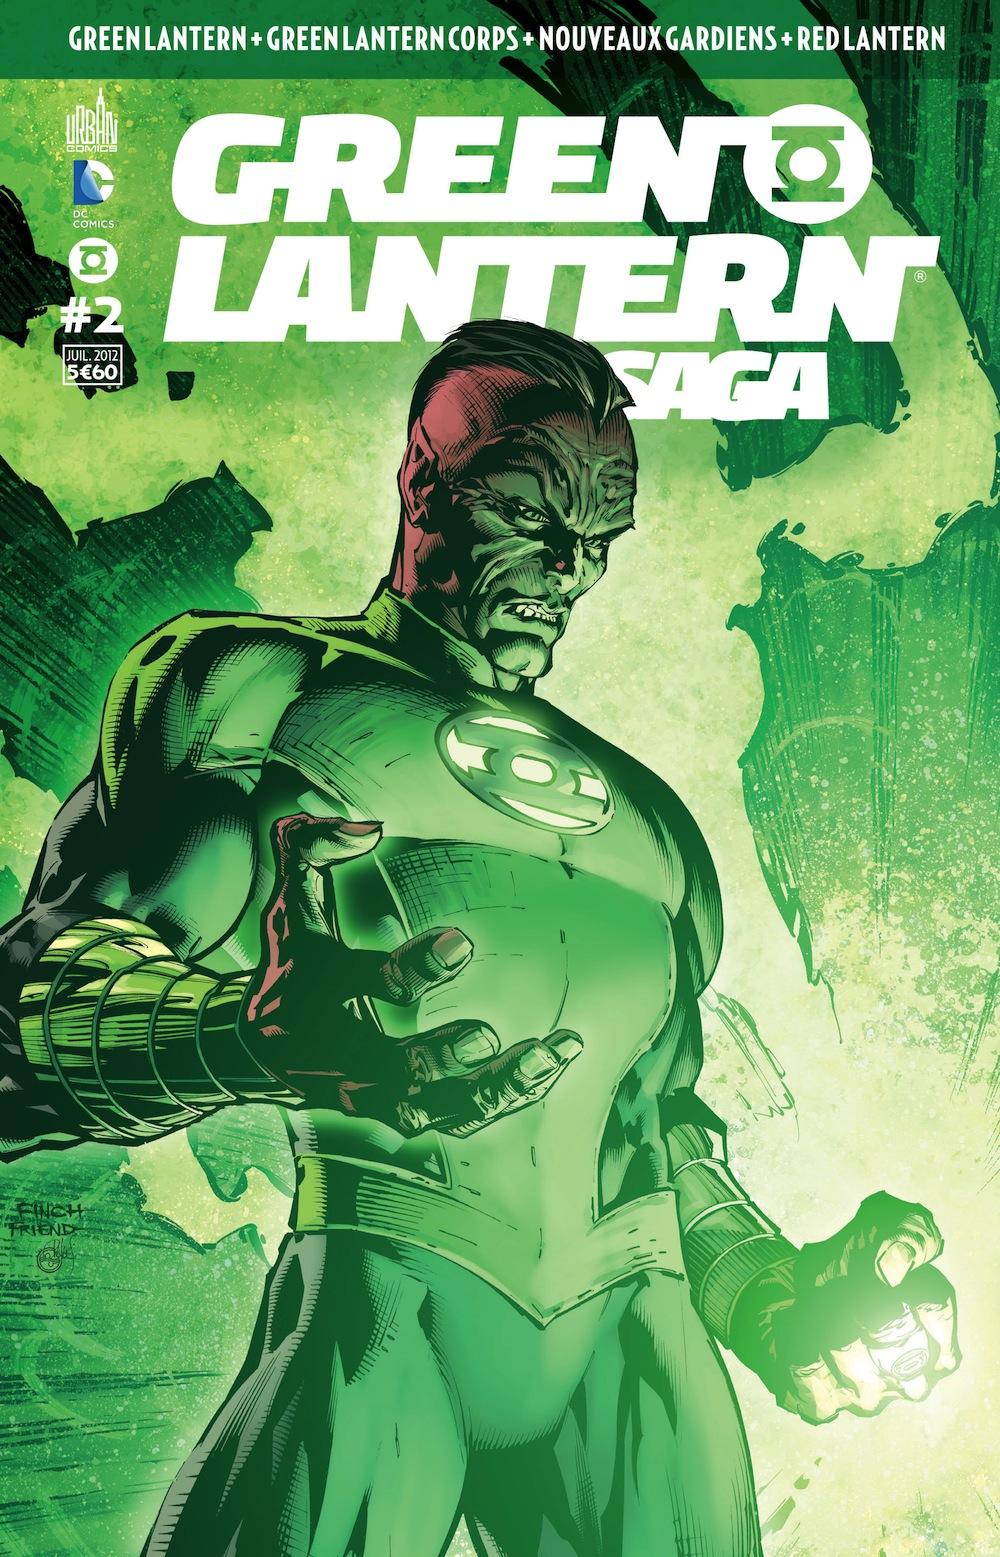 Green Lantern Saga #2